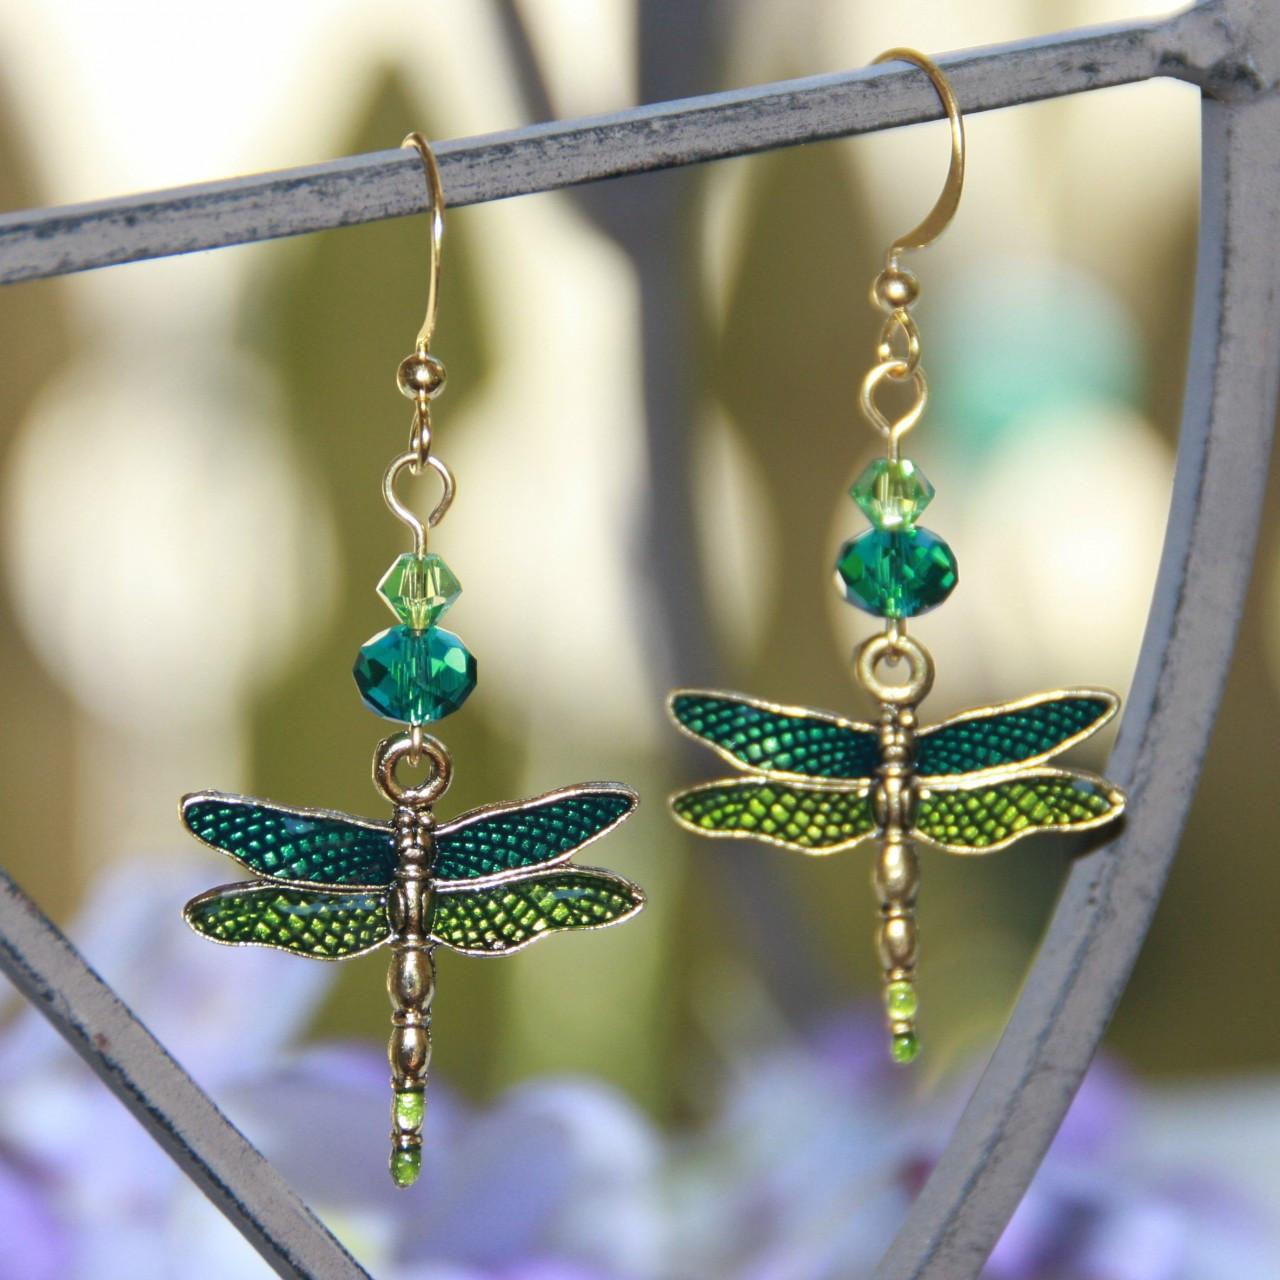 AER-20 Enamel Dragonfly Earrings